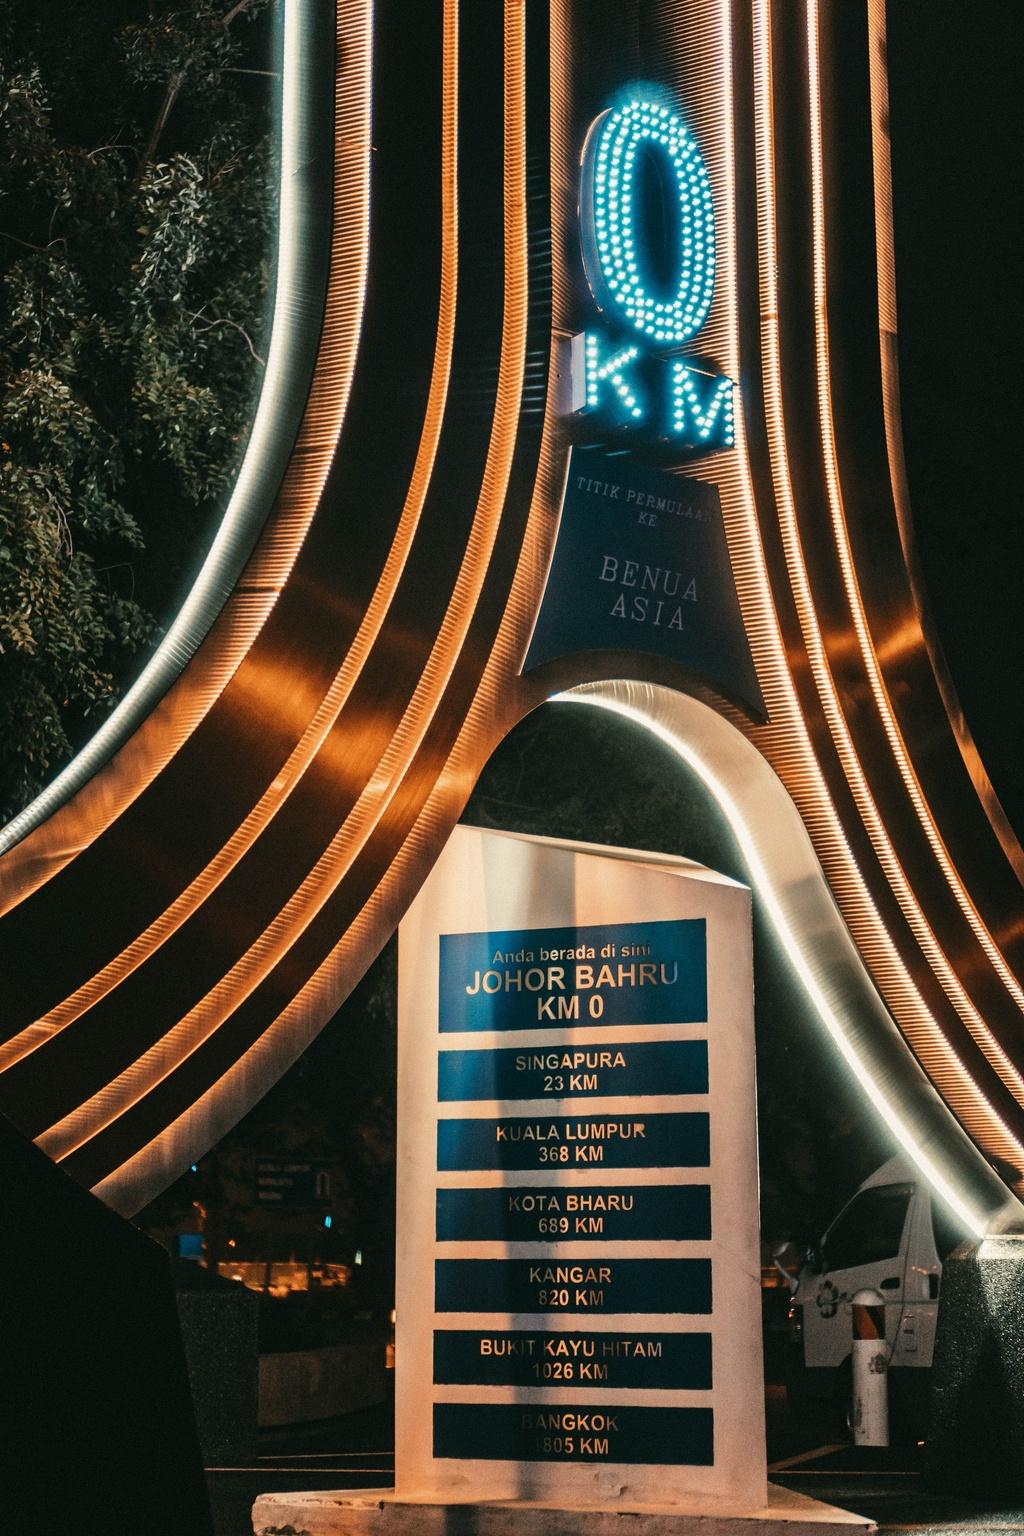 Travel blogger Gia Ngoc Hue diem danh 7 noi phai den o Johor Bahru hinh anh 13